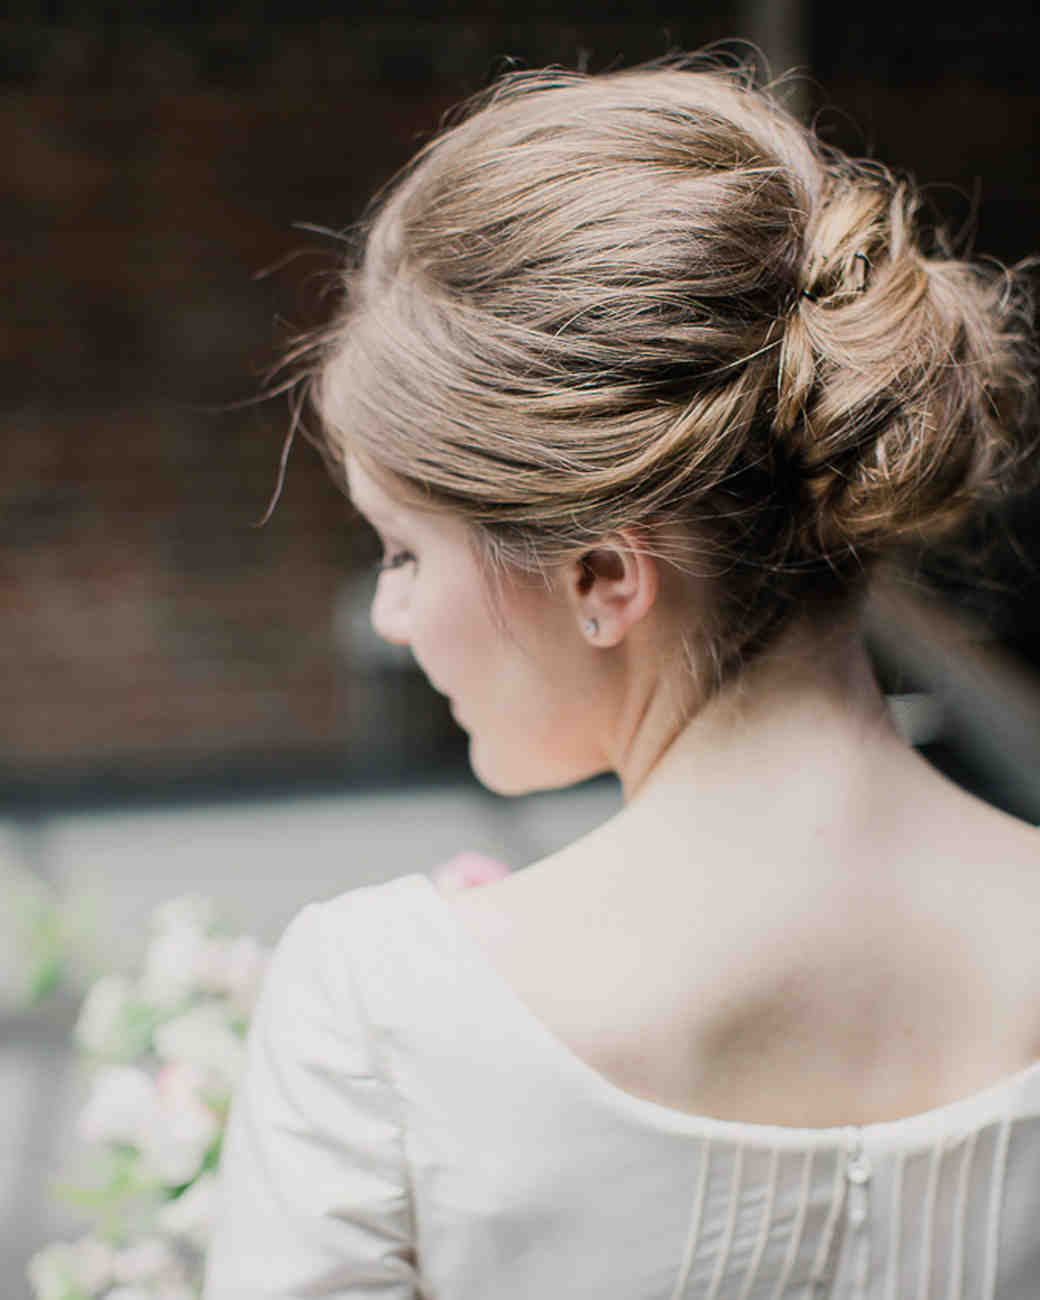 cristina-jason-wedding-upda-0259-s112017-0715.jpg